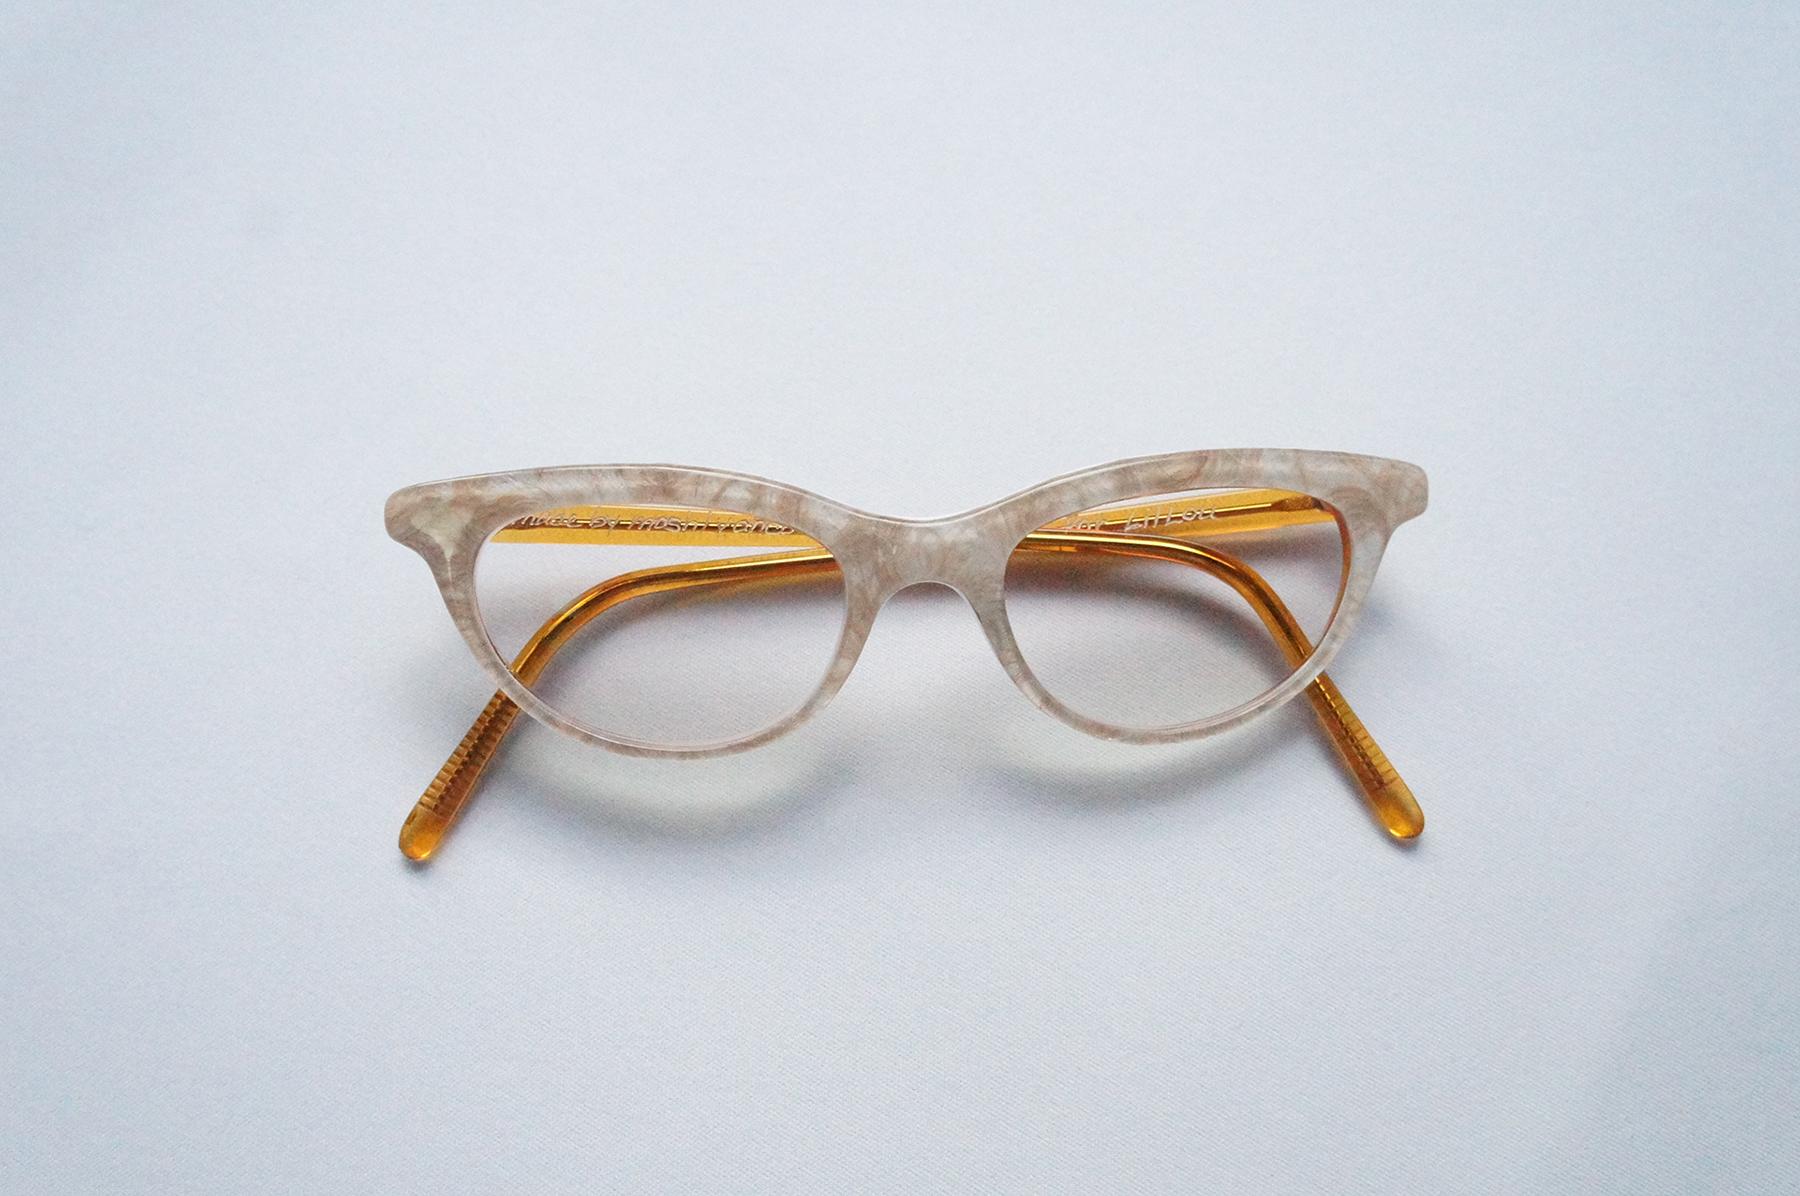 Artisanal Dog Hair Eyeglasses - Handcrafted in Vancouver.JPG